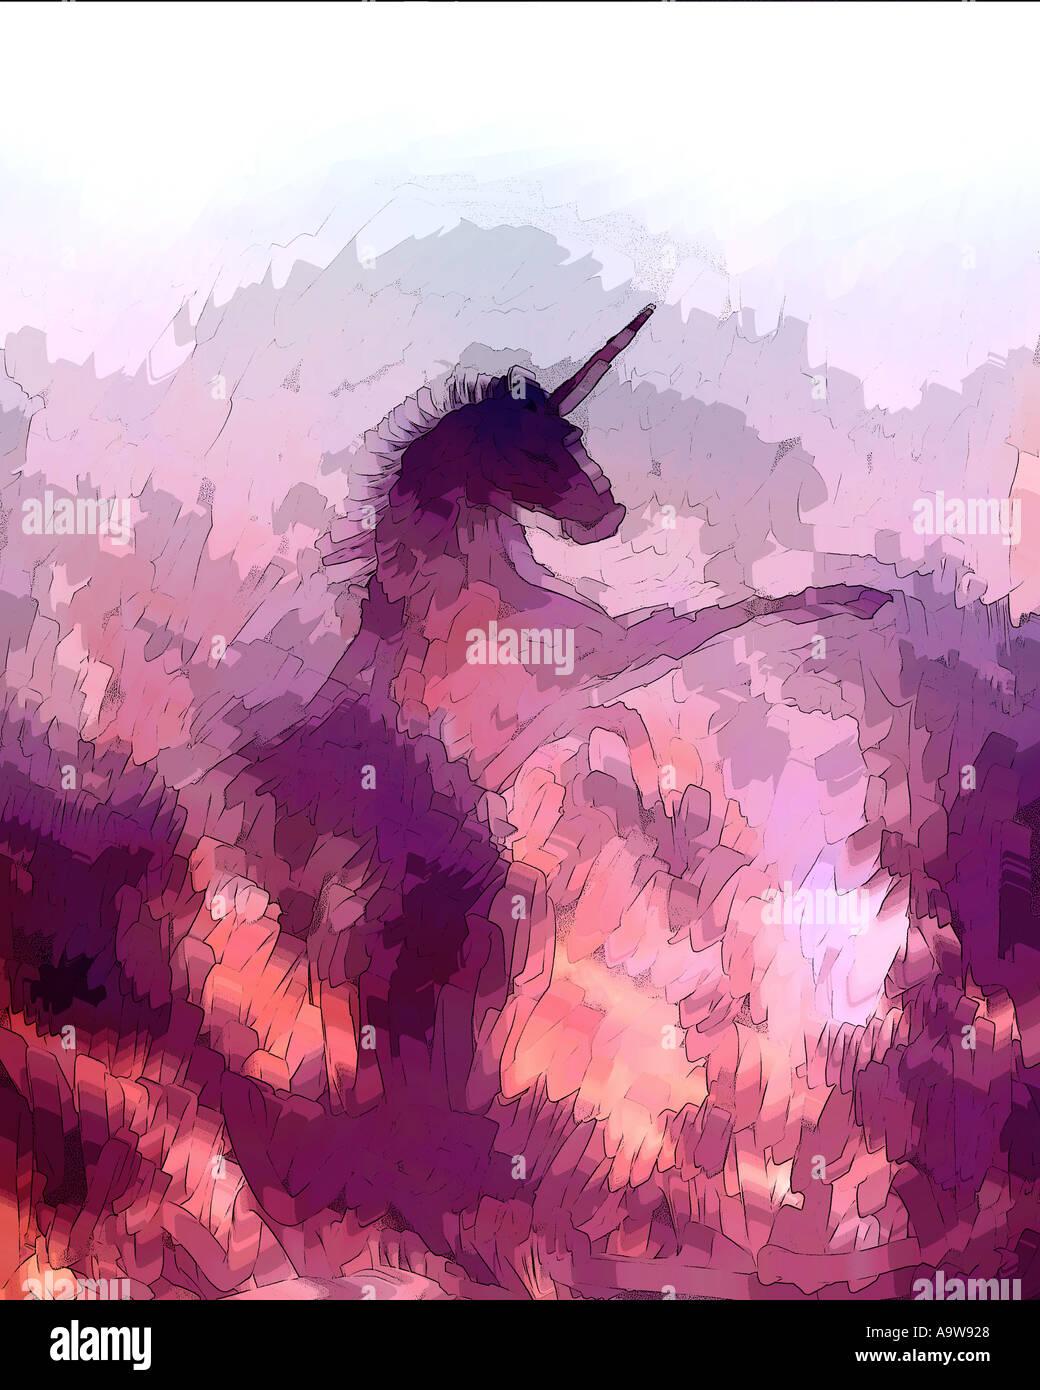 Unicorn silhouette in clouds - Stock Image